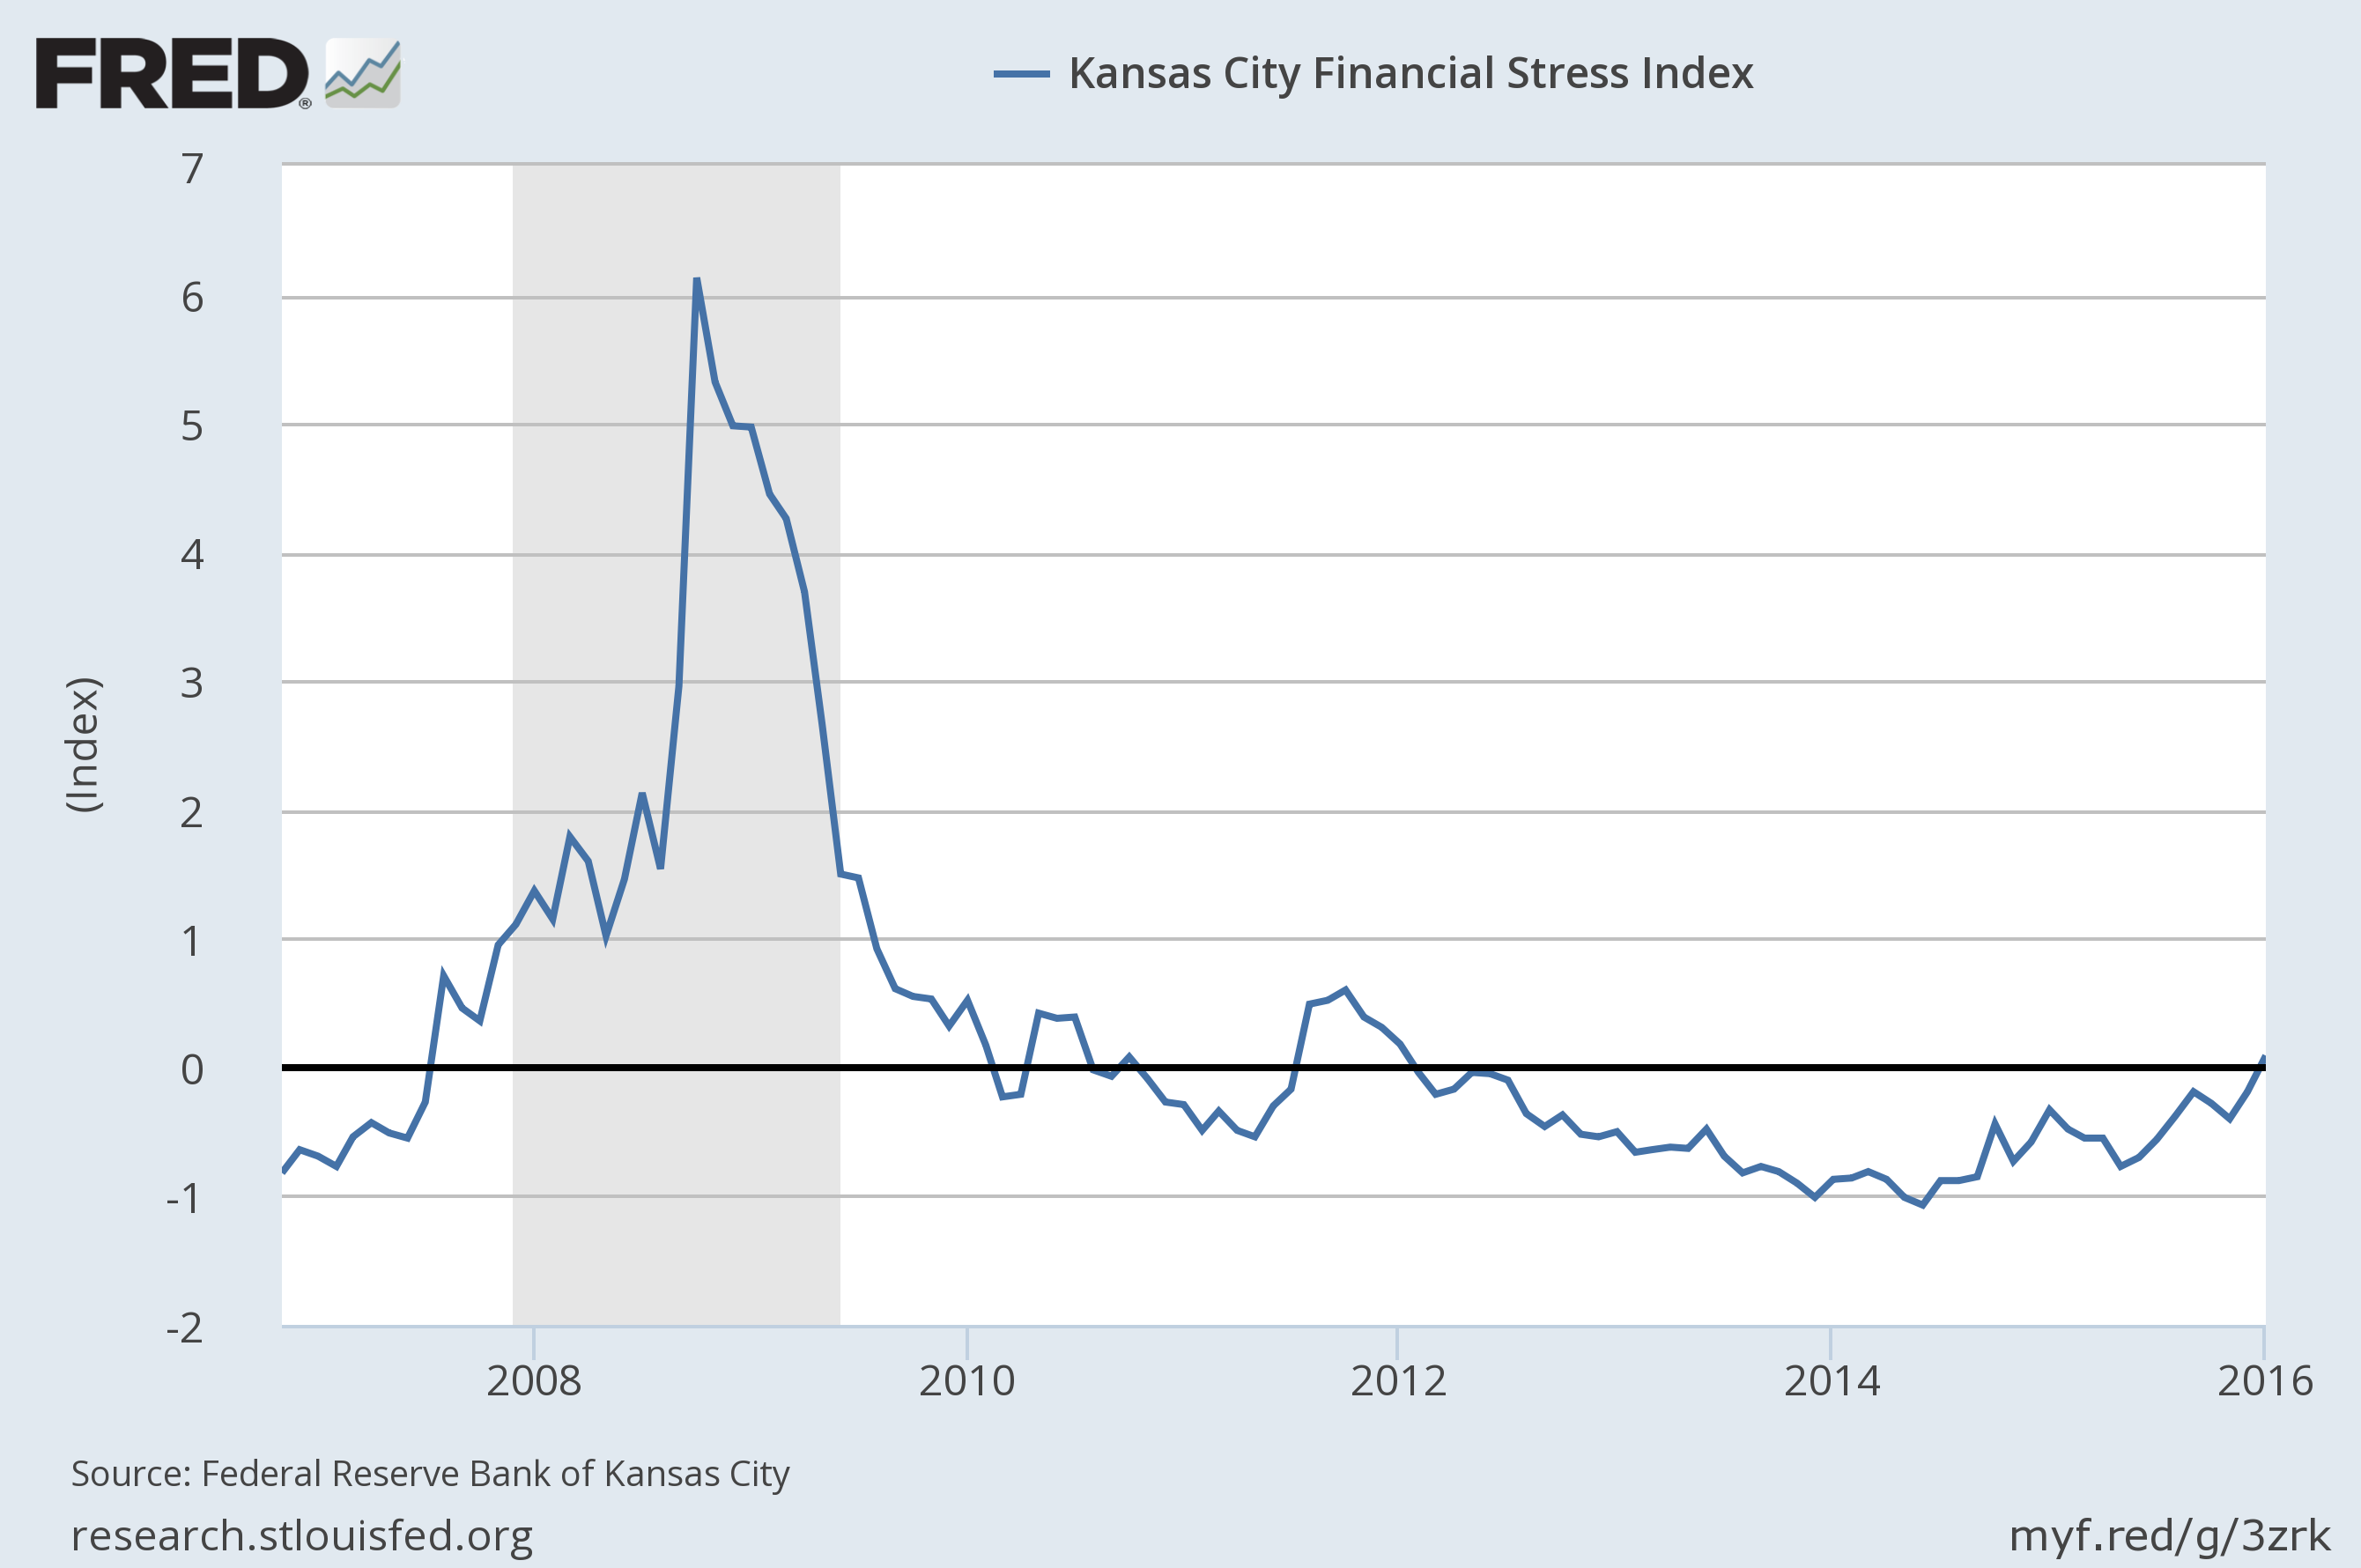 Kansas City Financial Stress Index